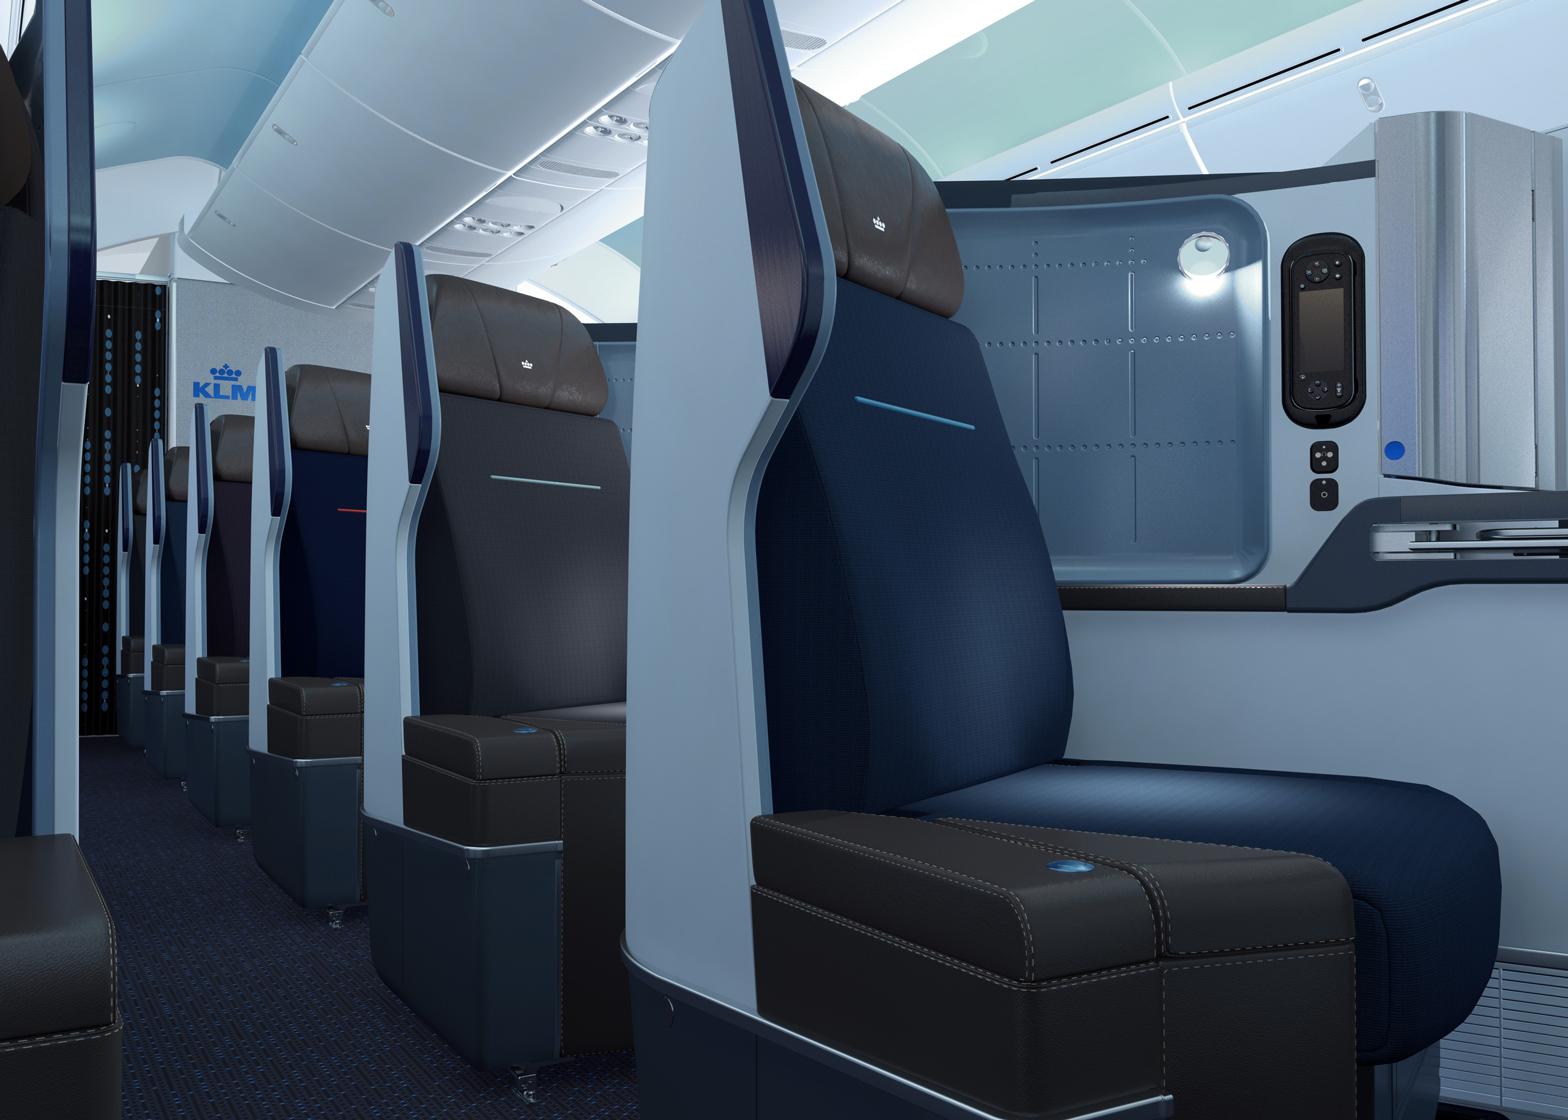 Hella Jongerius Designs Interiors For KLMu0027s Boeing 787 Aircraft